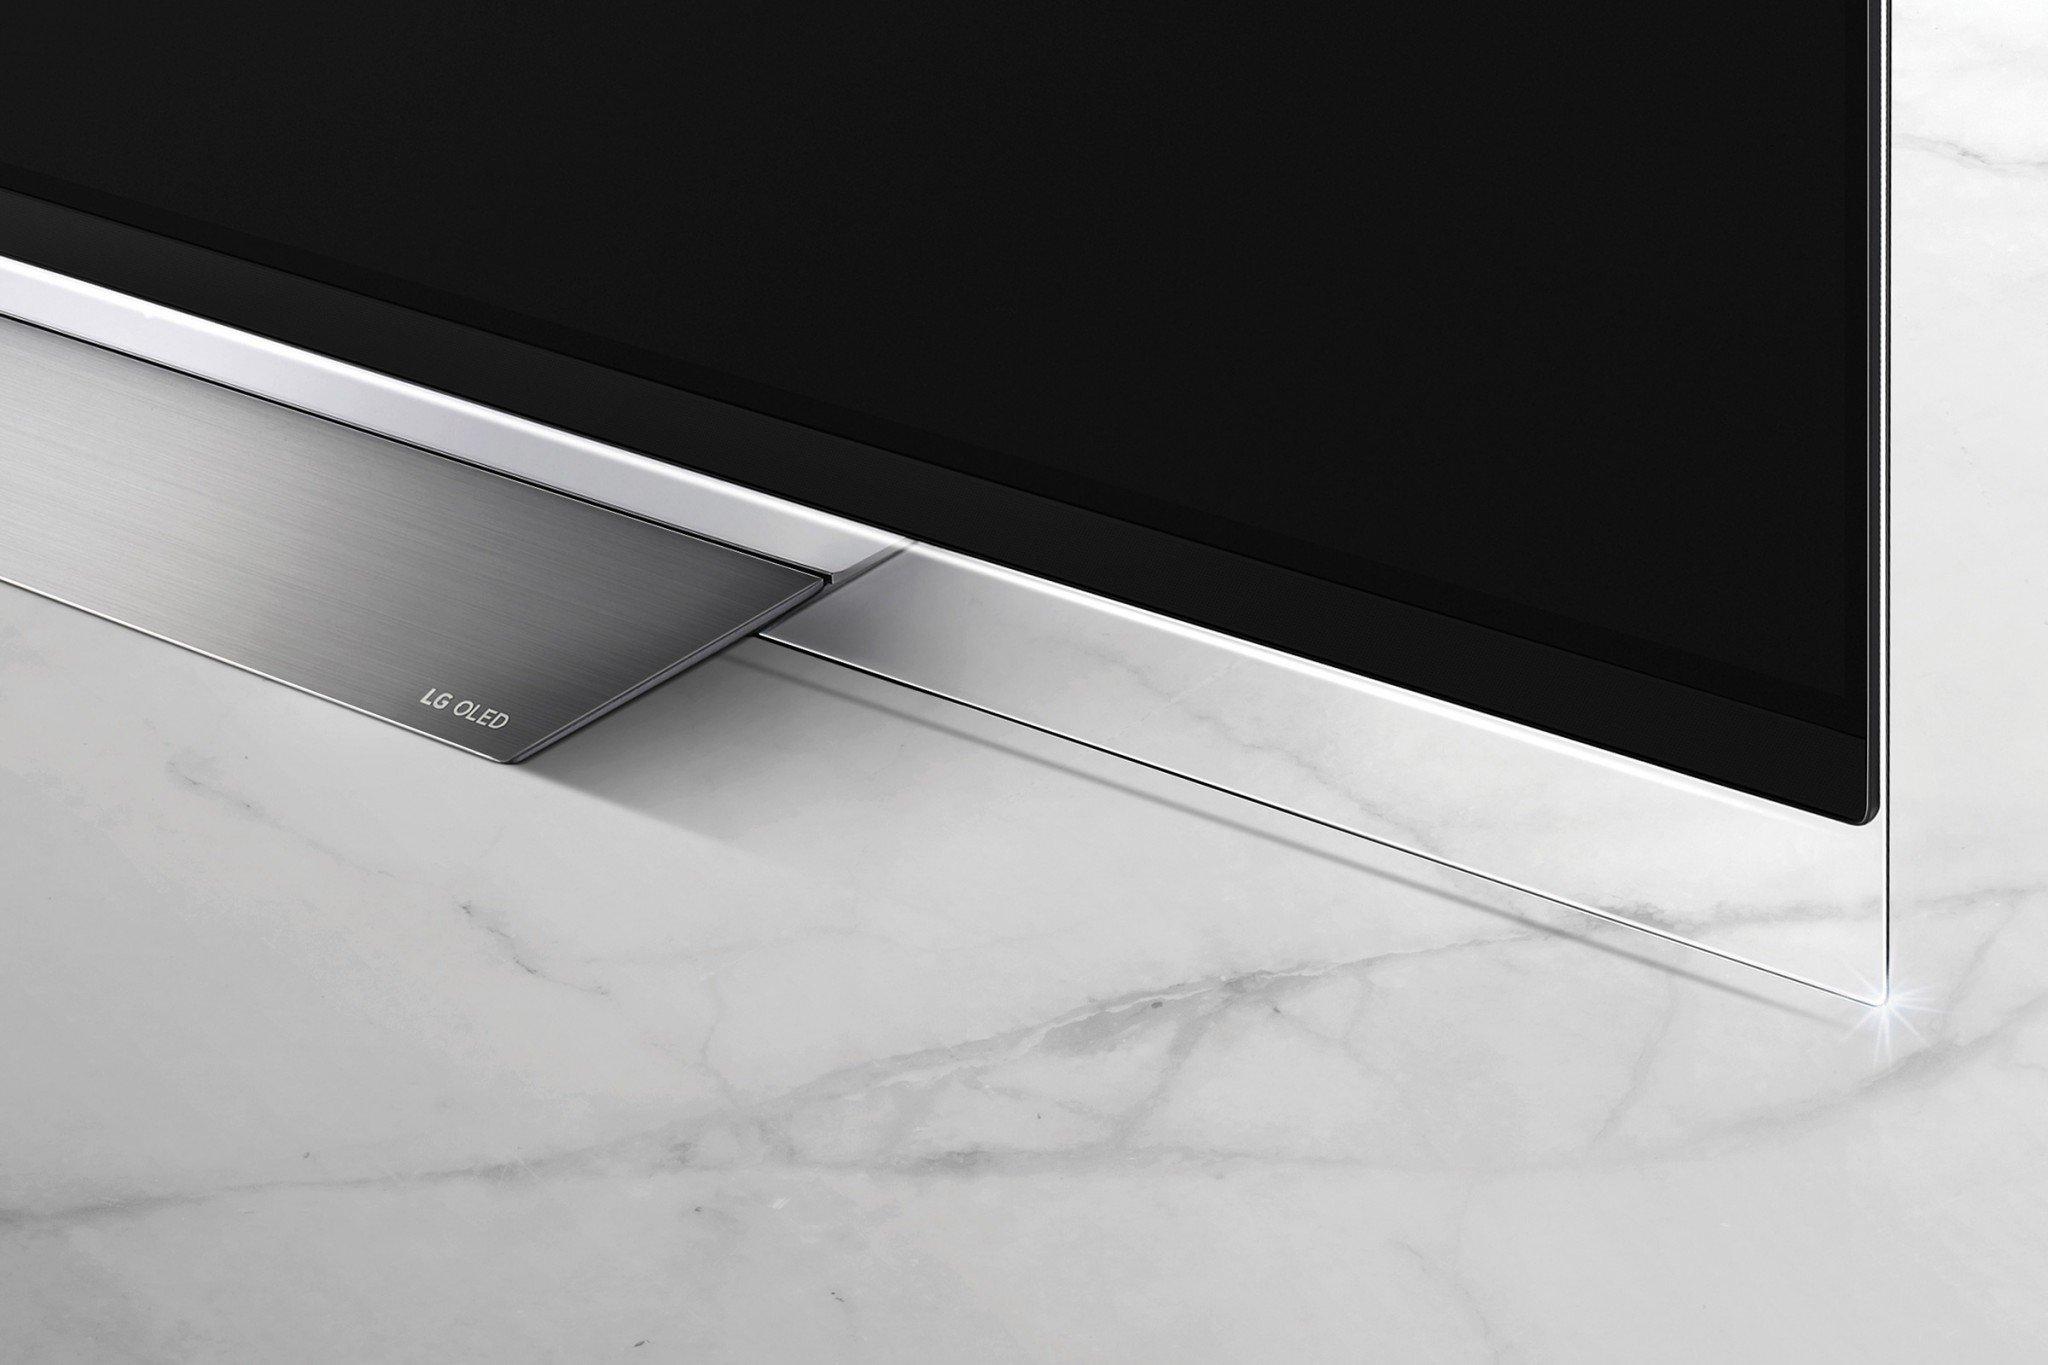 LG E8 OLED fod glas design